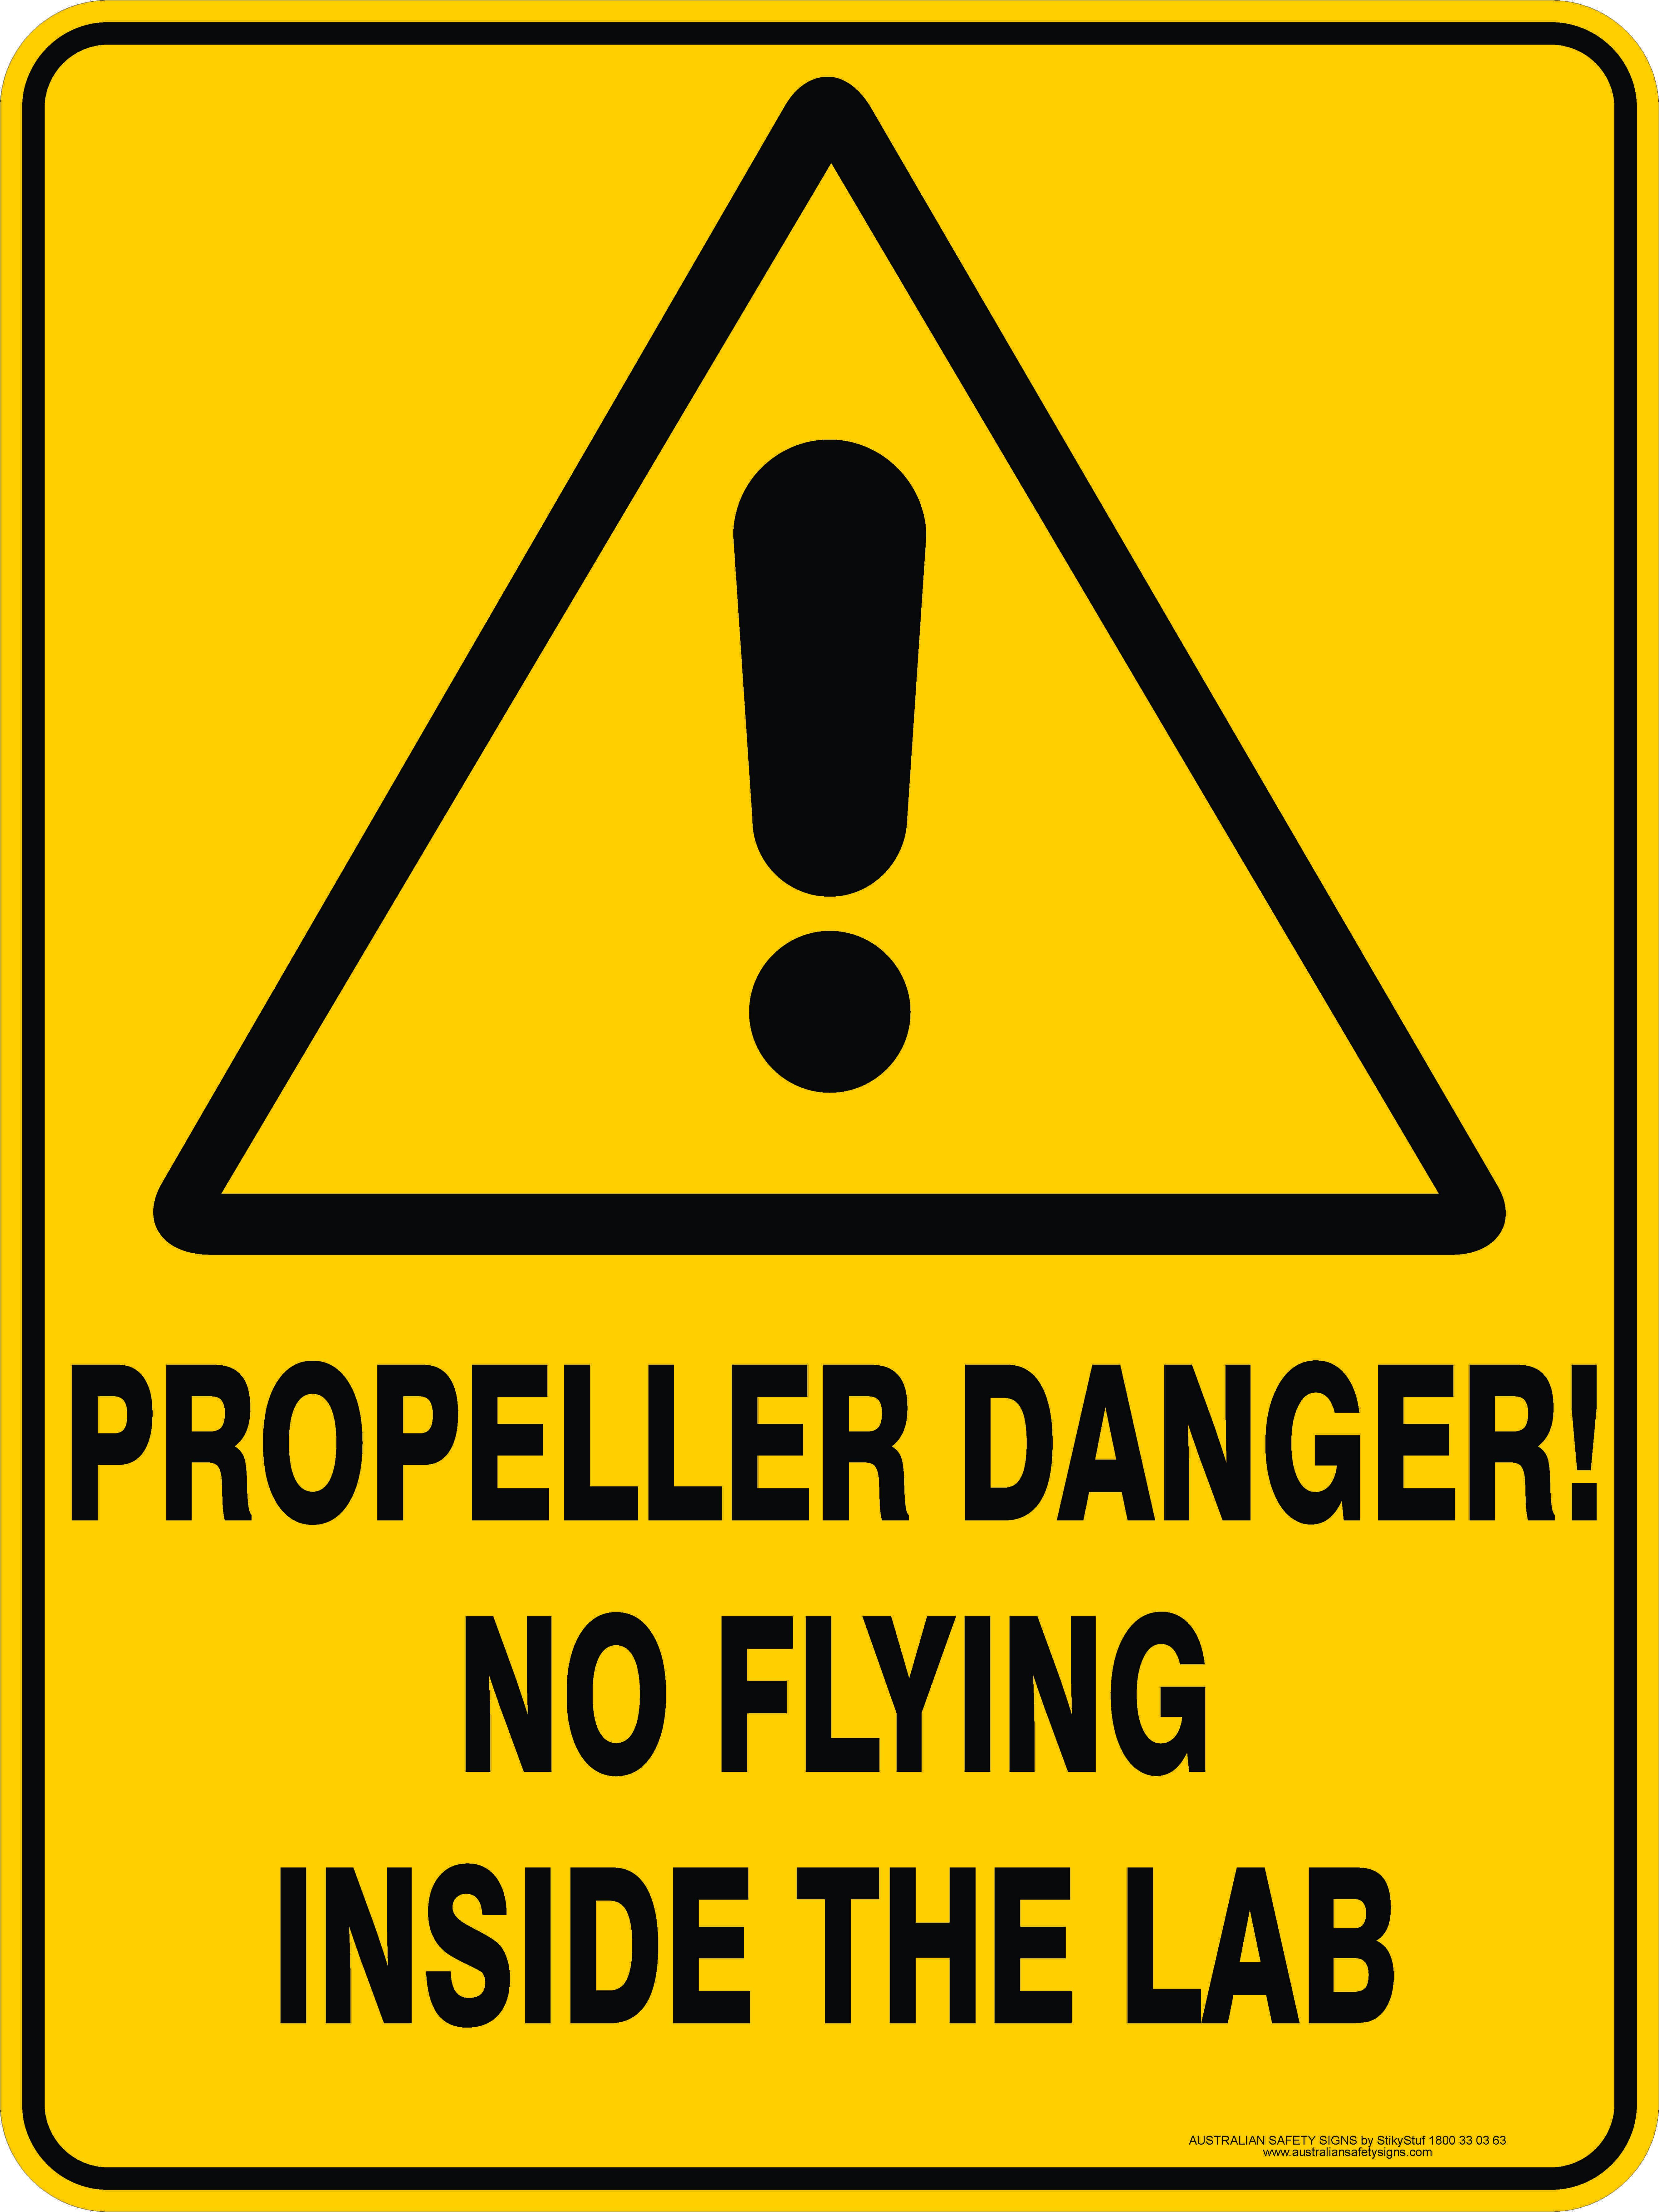 Warning Signs PROPELLER DANGER! NO FLYING INSIDE THE LAB